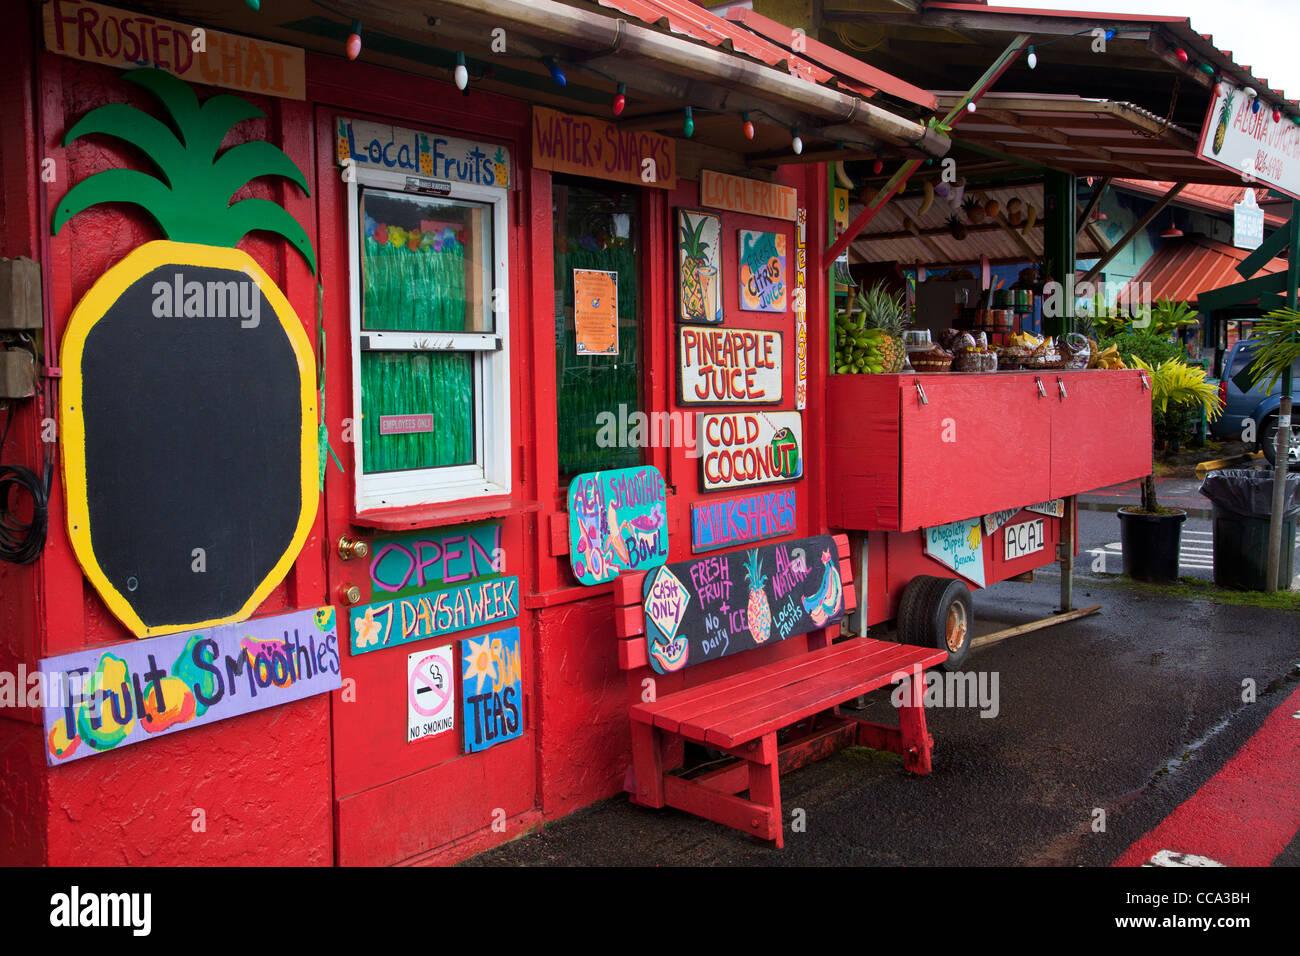 Fruit stand, Hanalei, Kauai, Hawaii. - Stock Image